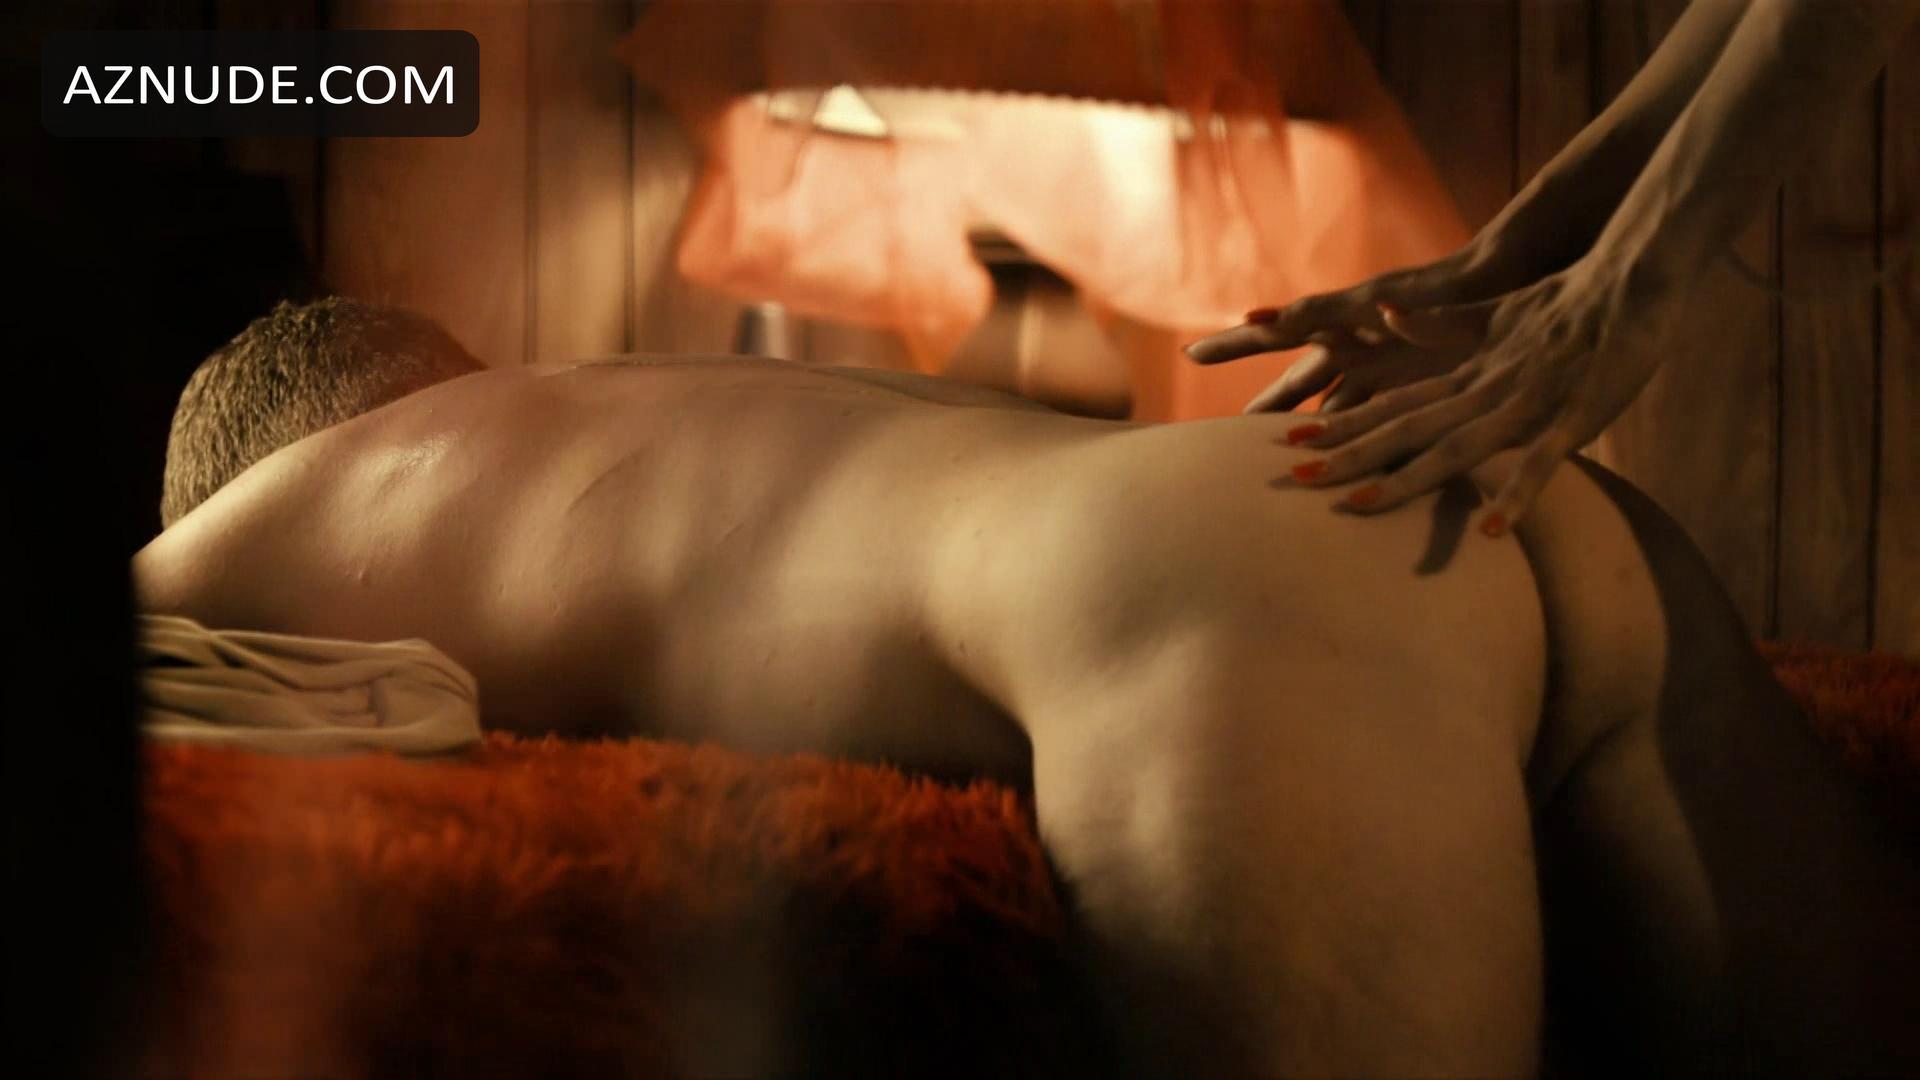 Michael Cudlitz Nude - Aznude Men-1426